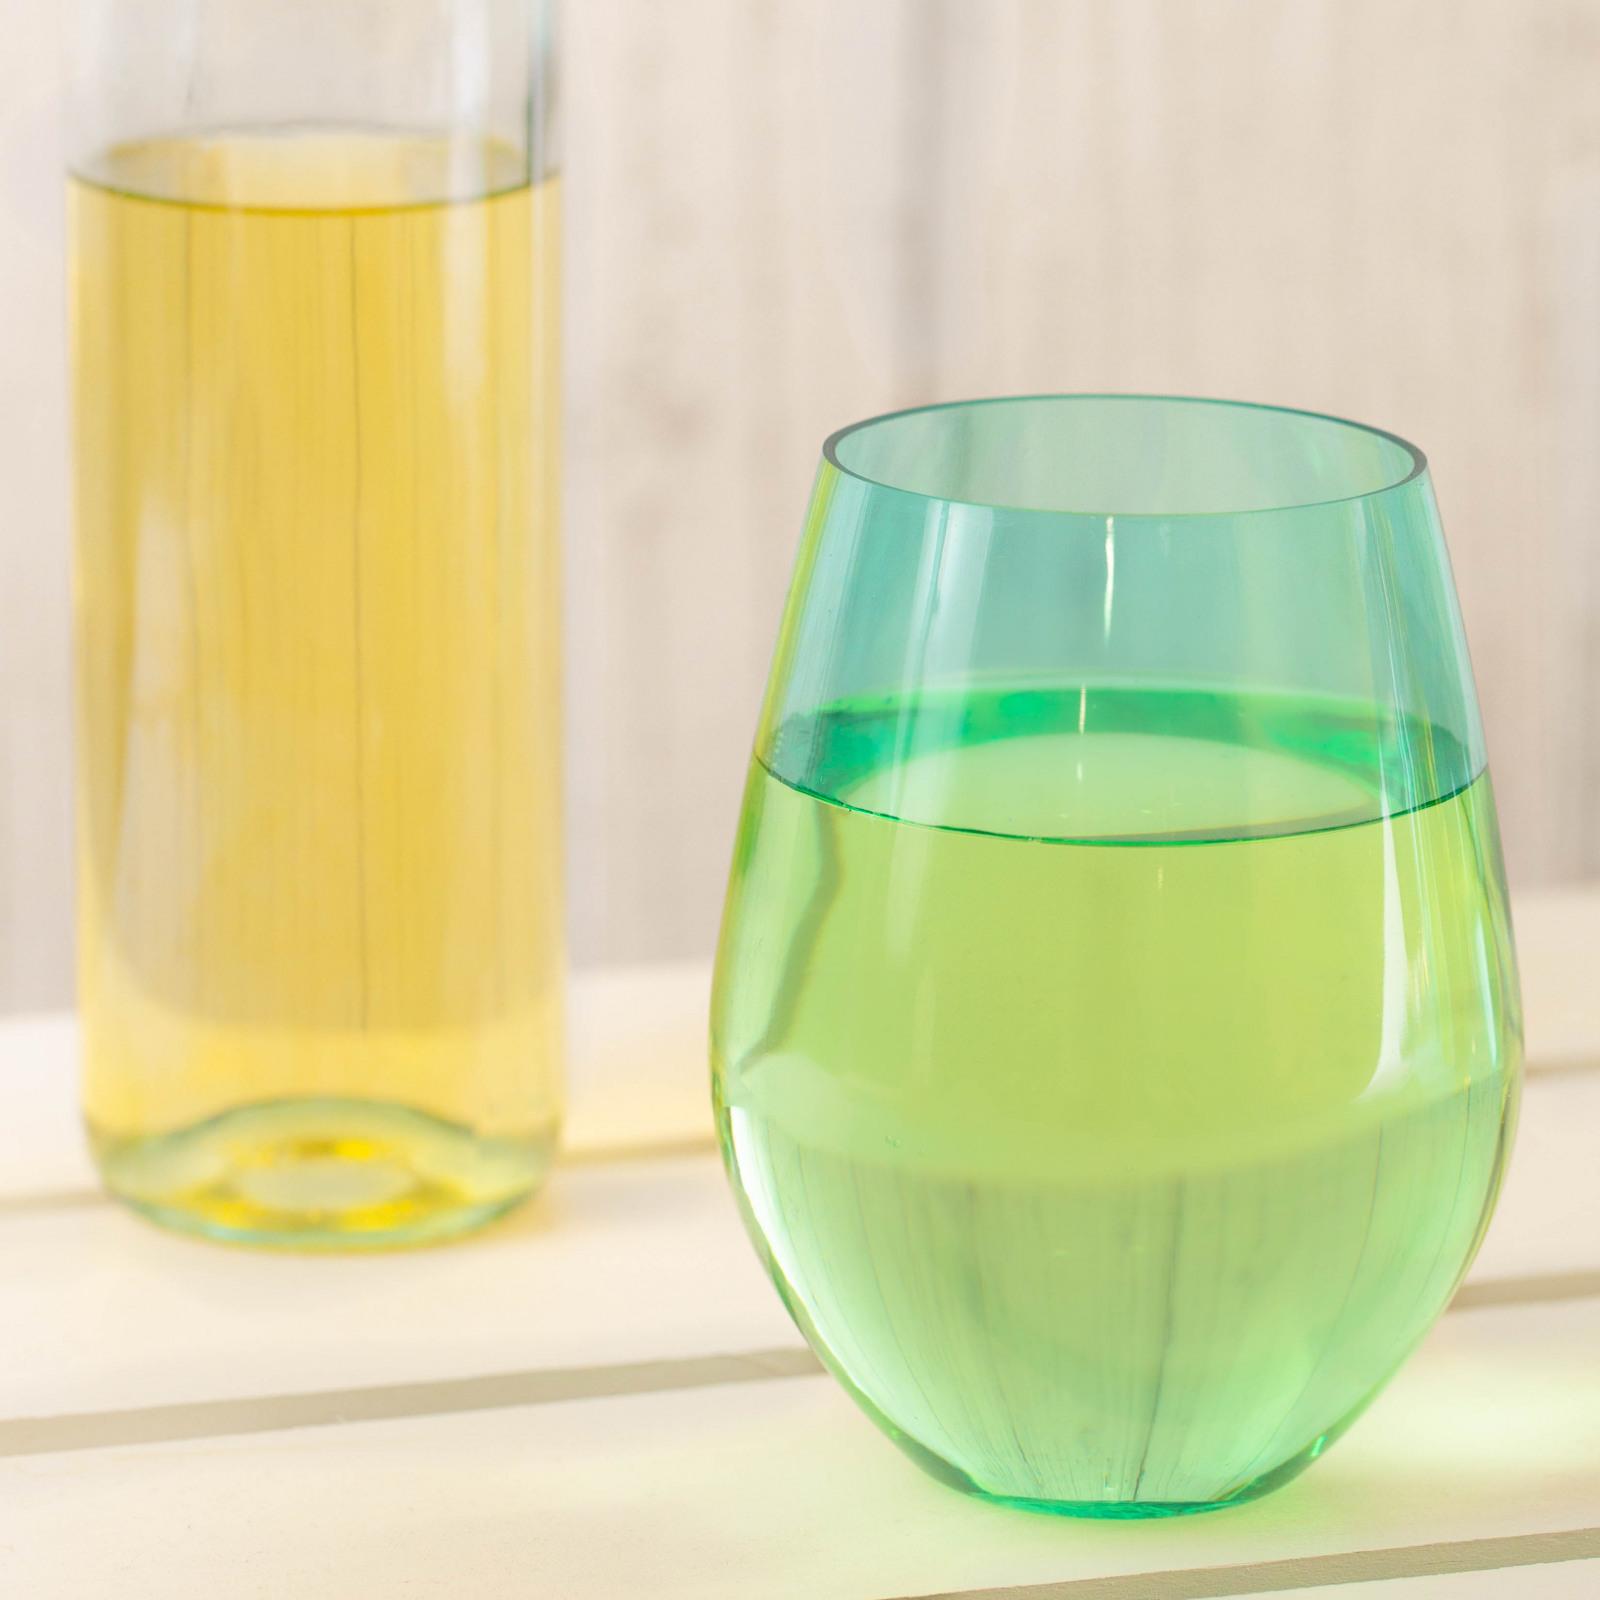 Jumbo Acrylic Stemless Wine Glass You Me & the Sea